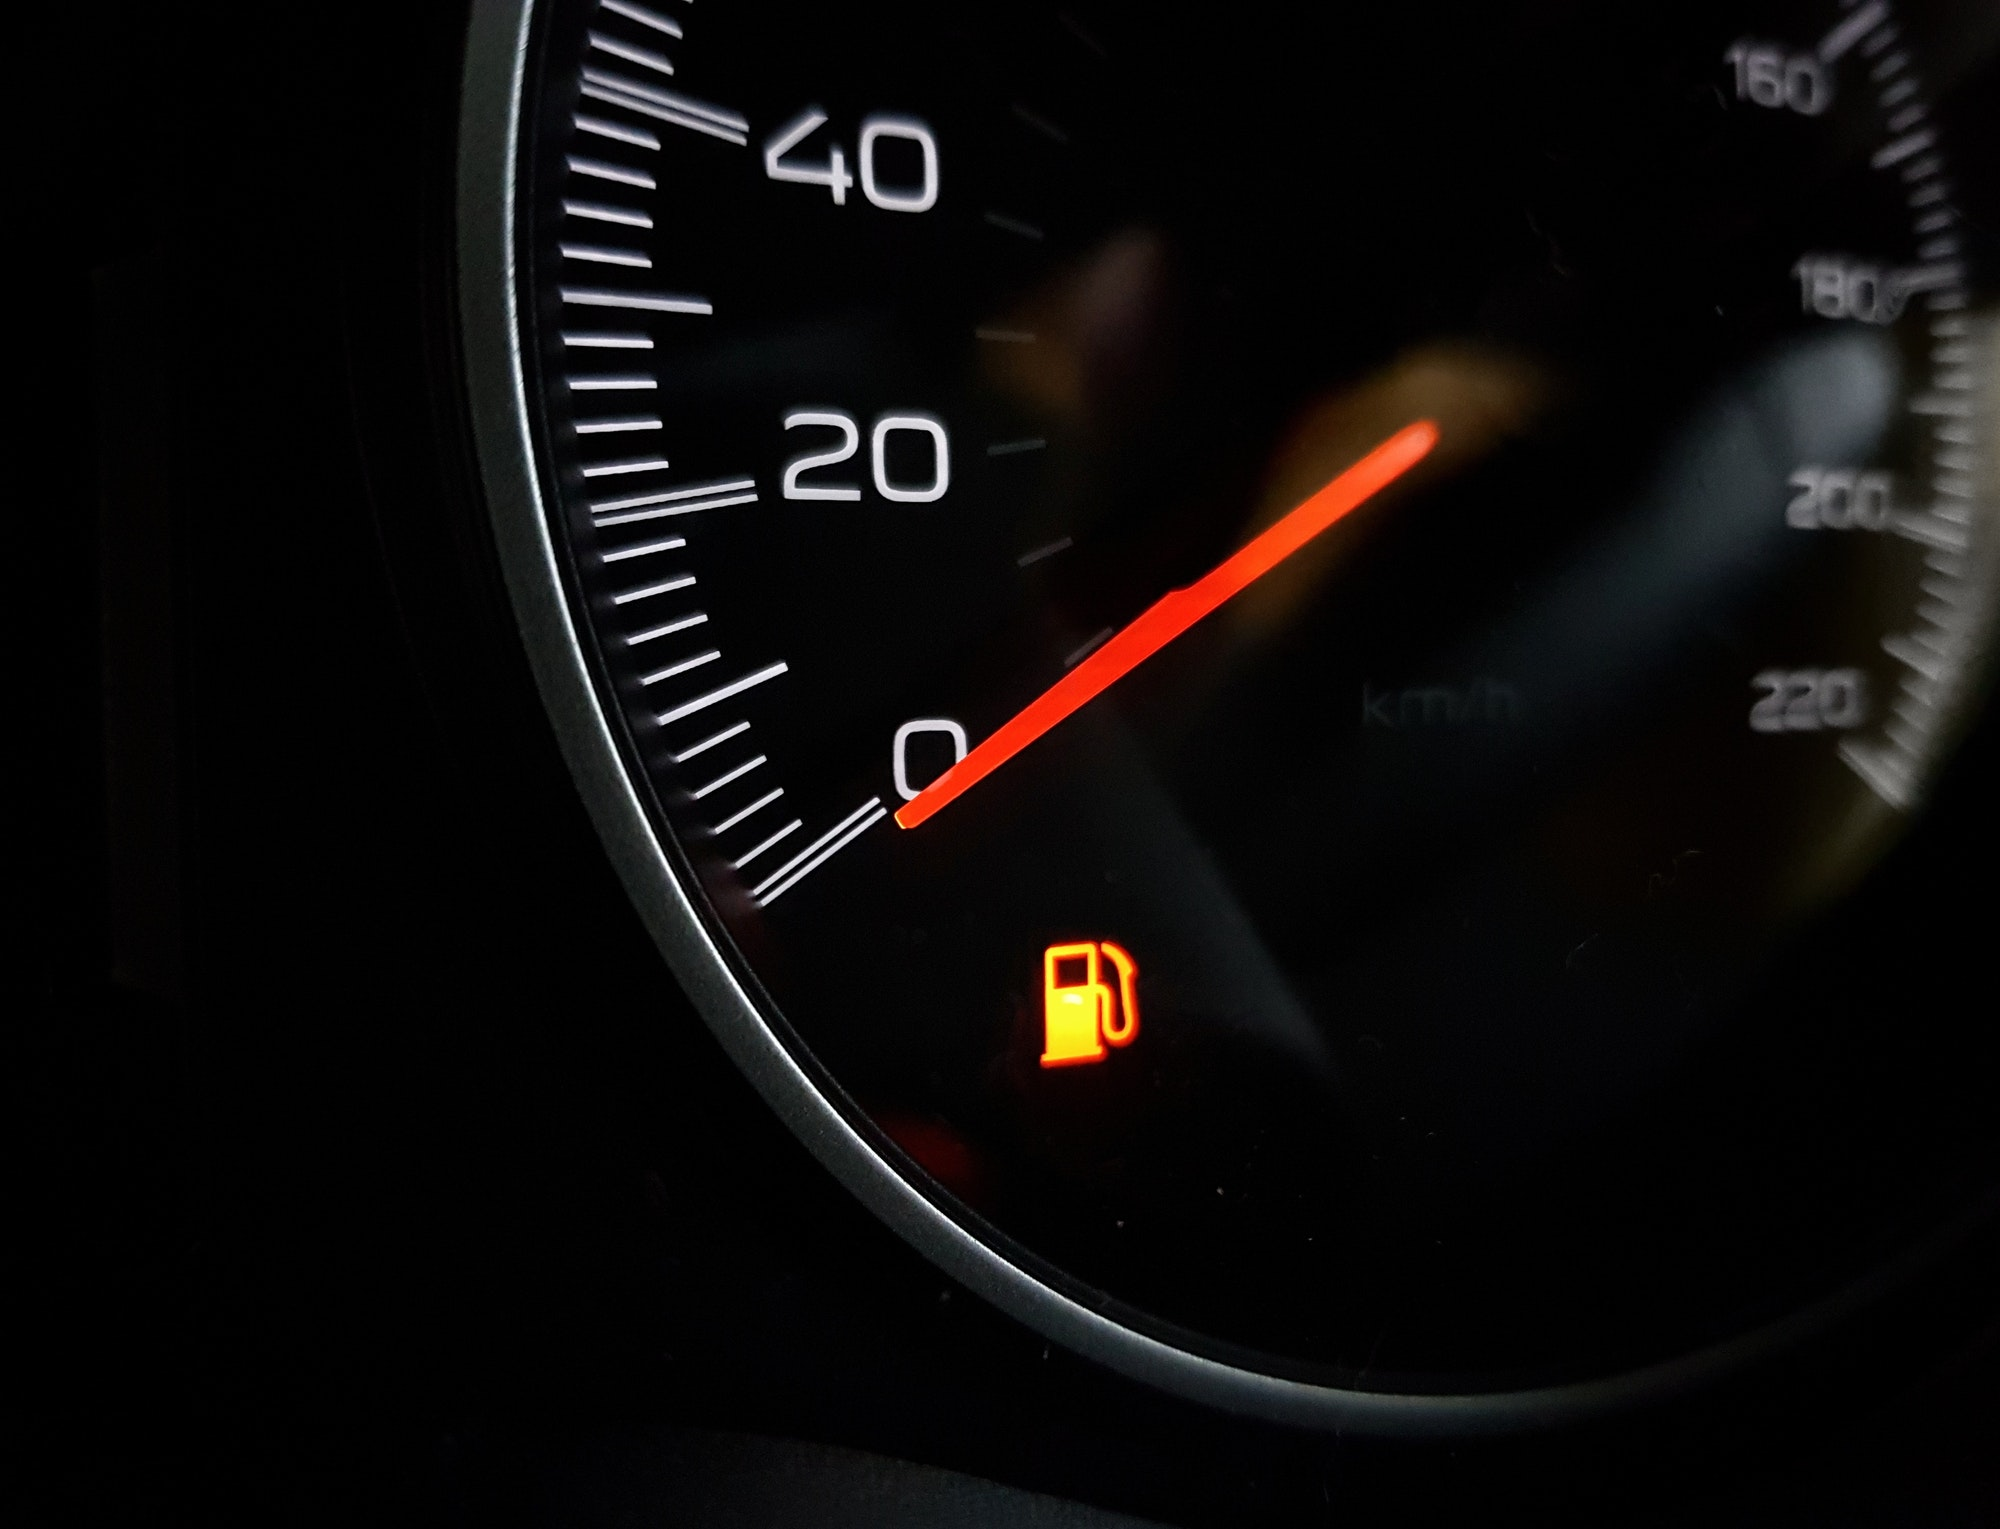 Orange low fuel indicator on a car dash